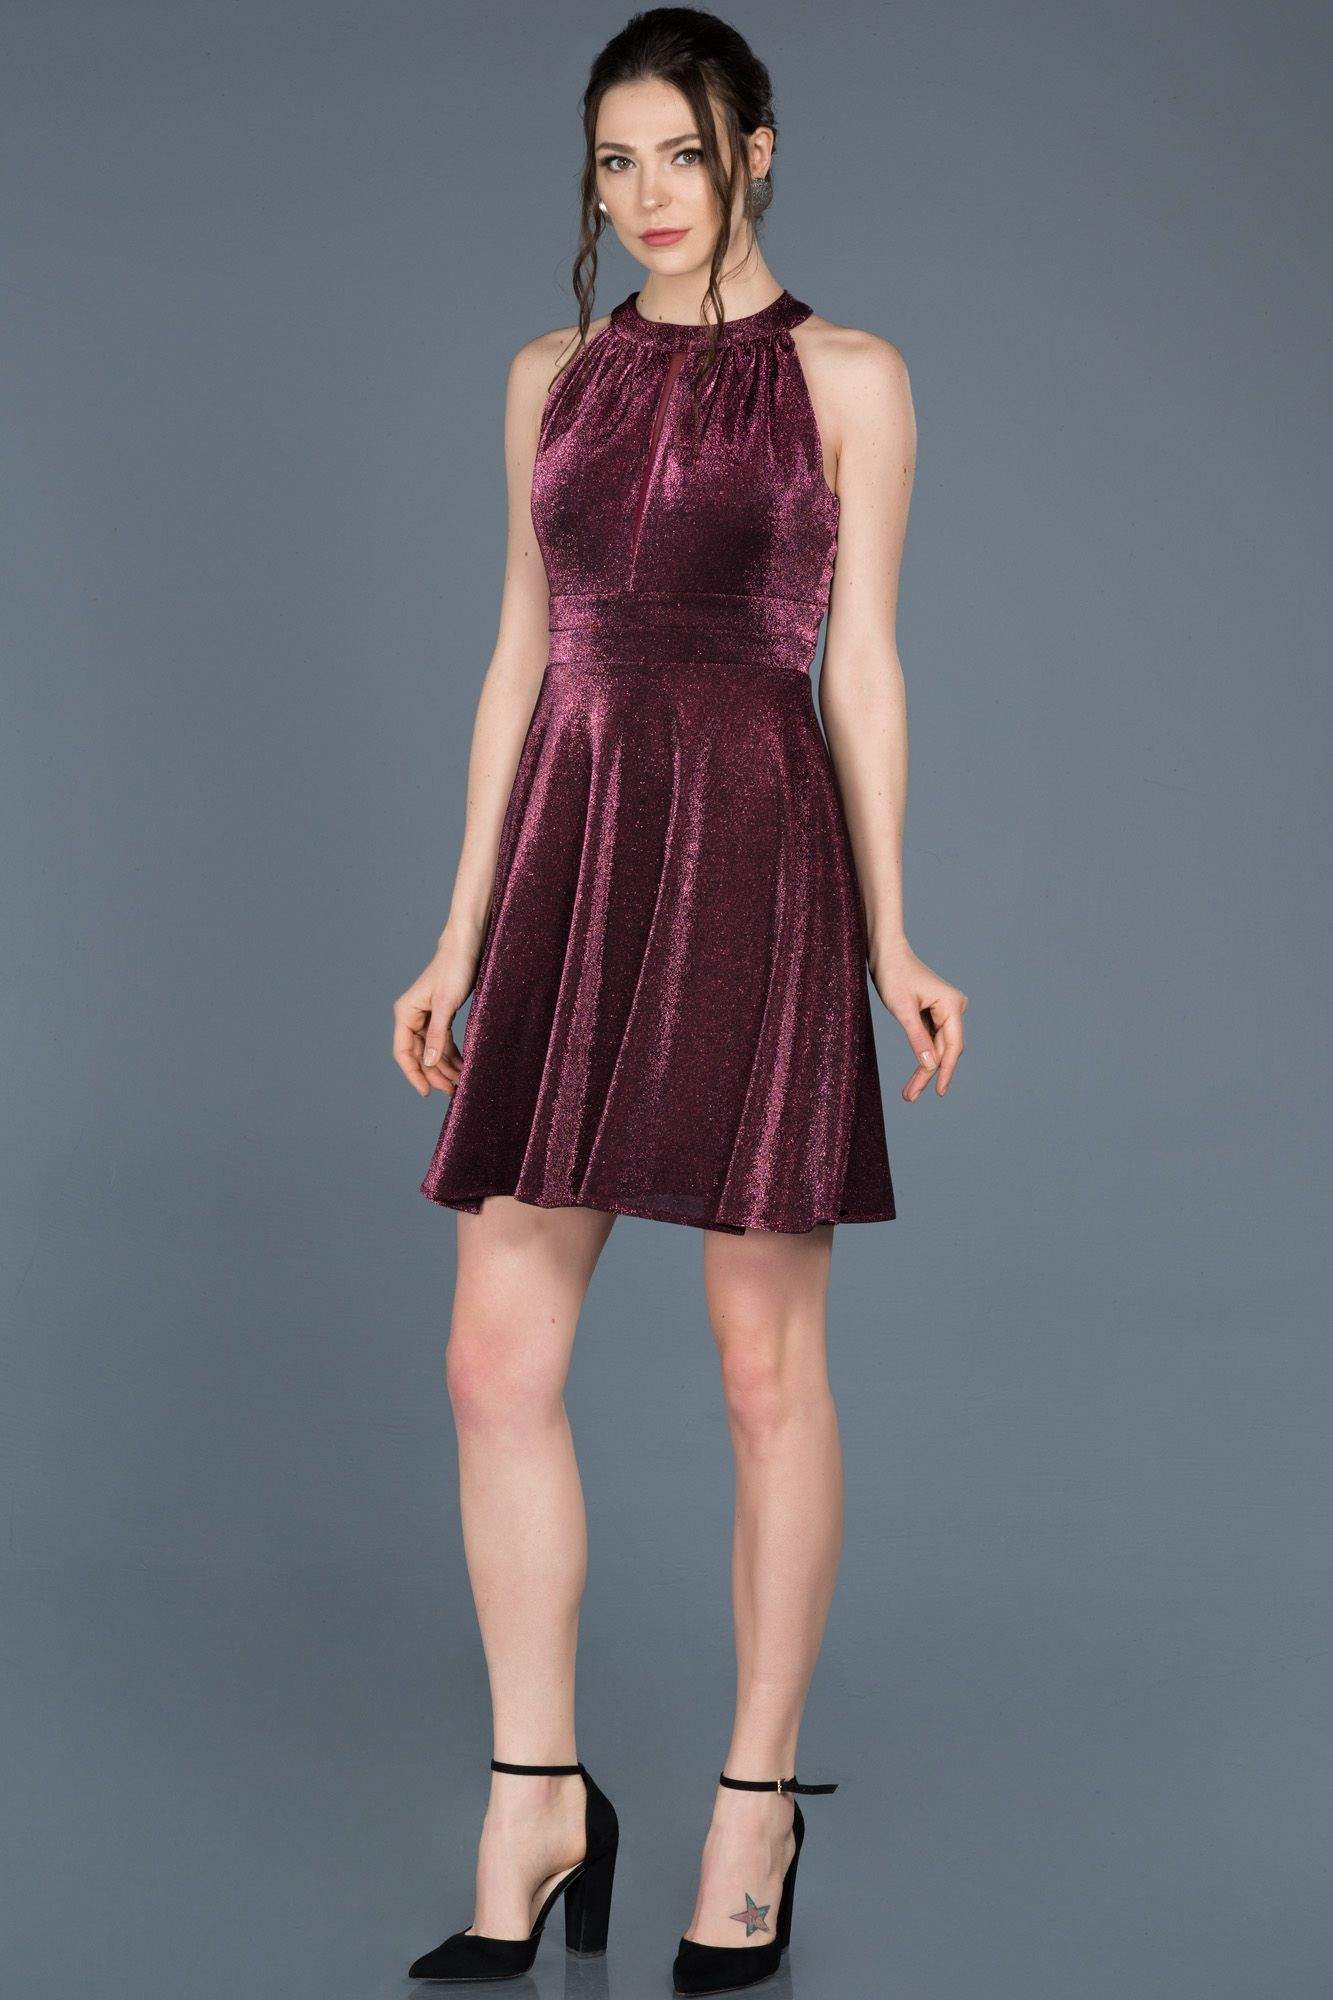 Murdum Kolsuz Mezuniyet Elbisesi Abk422 2020 Elbise Elbise Modelleri Mini Elbise